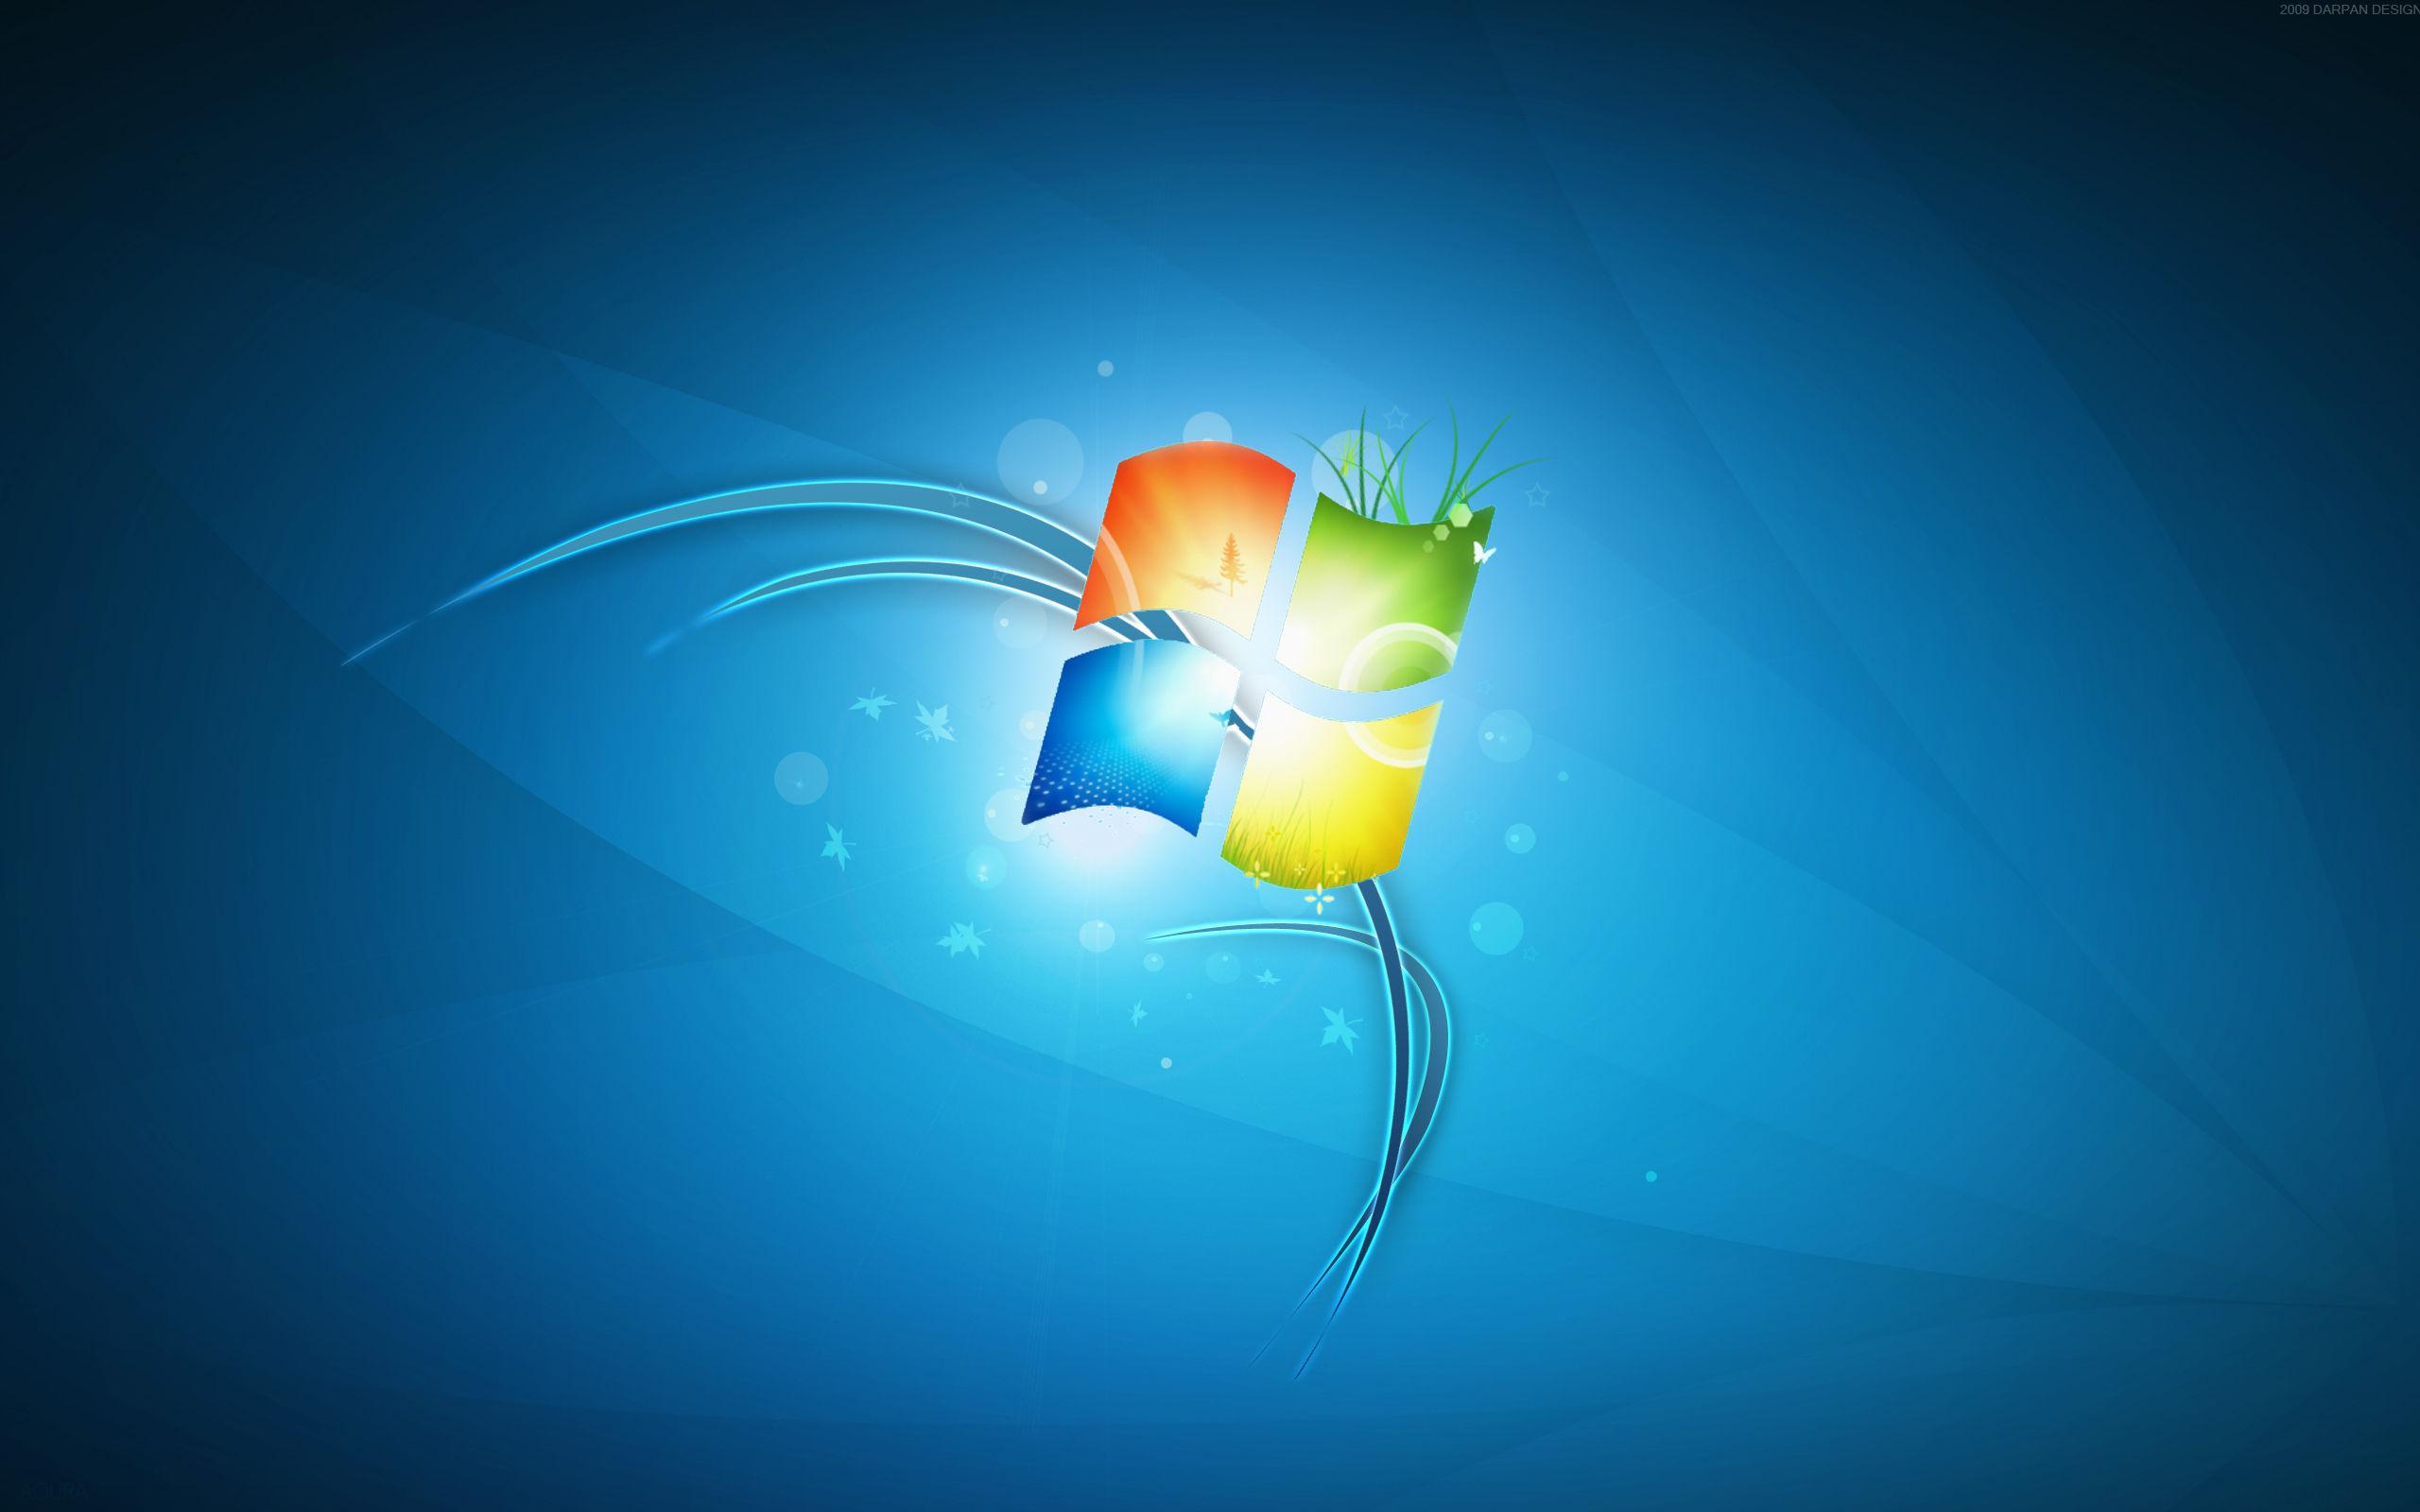 windows 8 de fond - photo #4